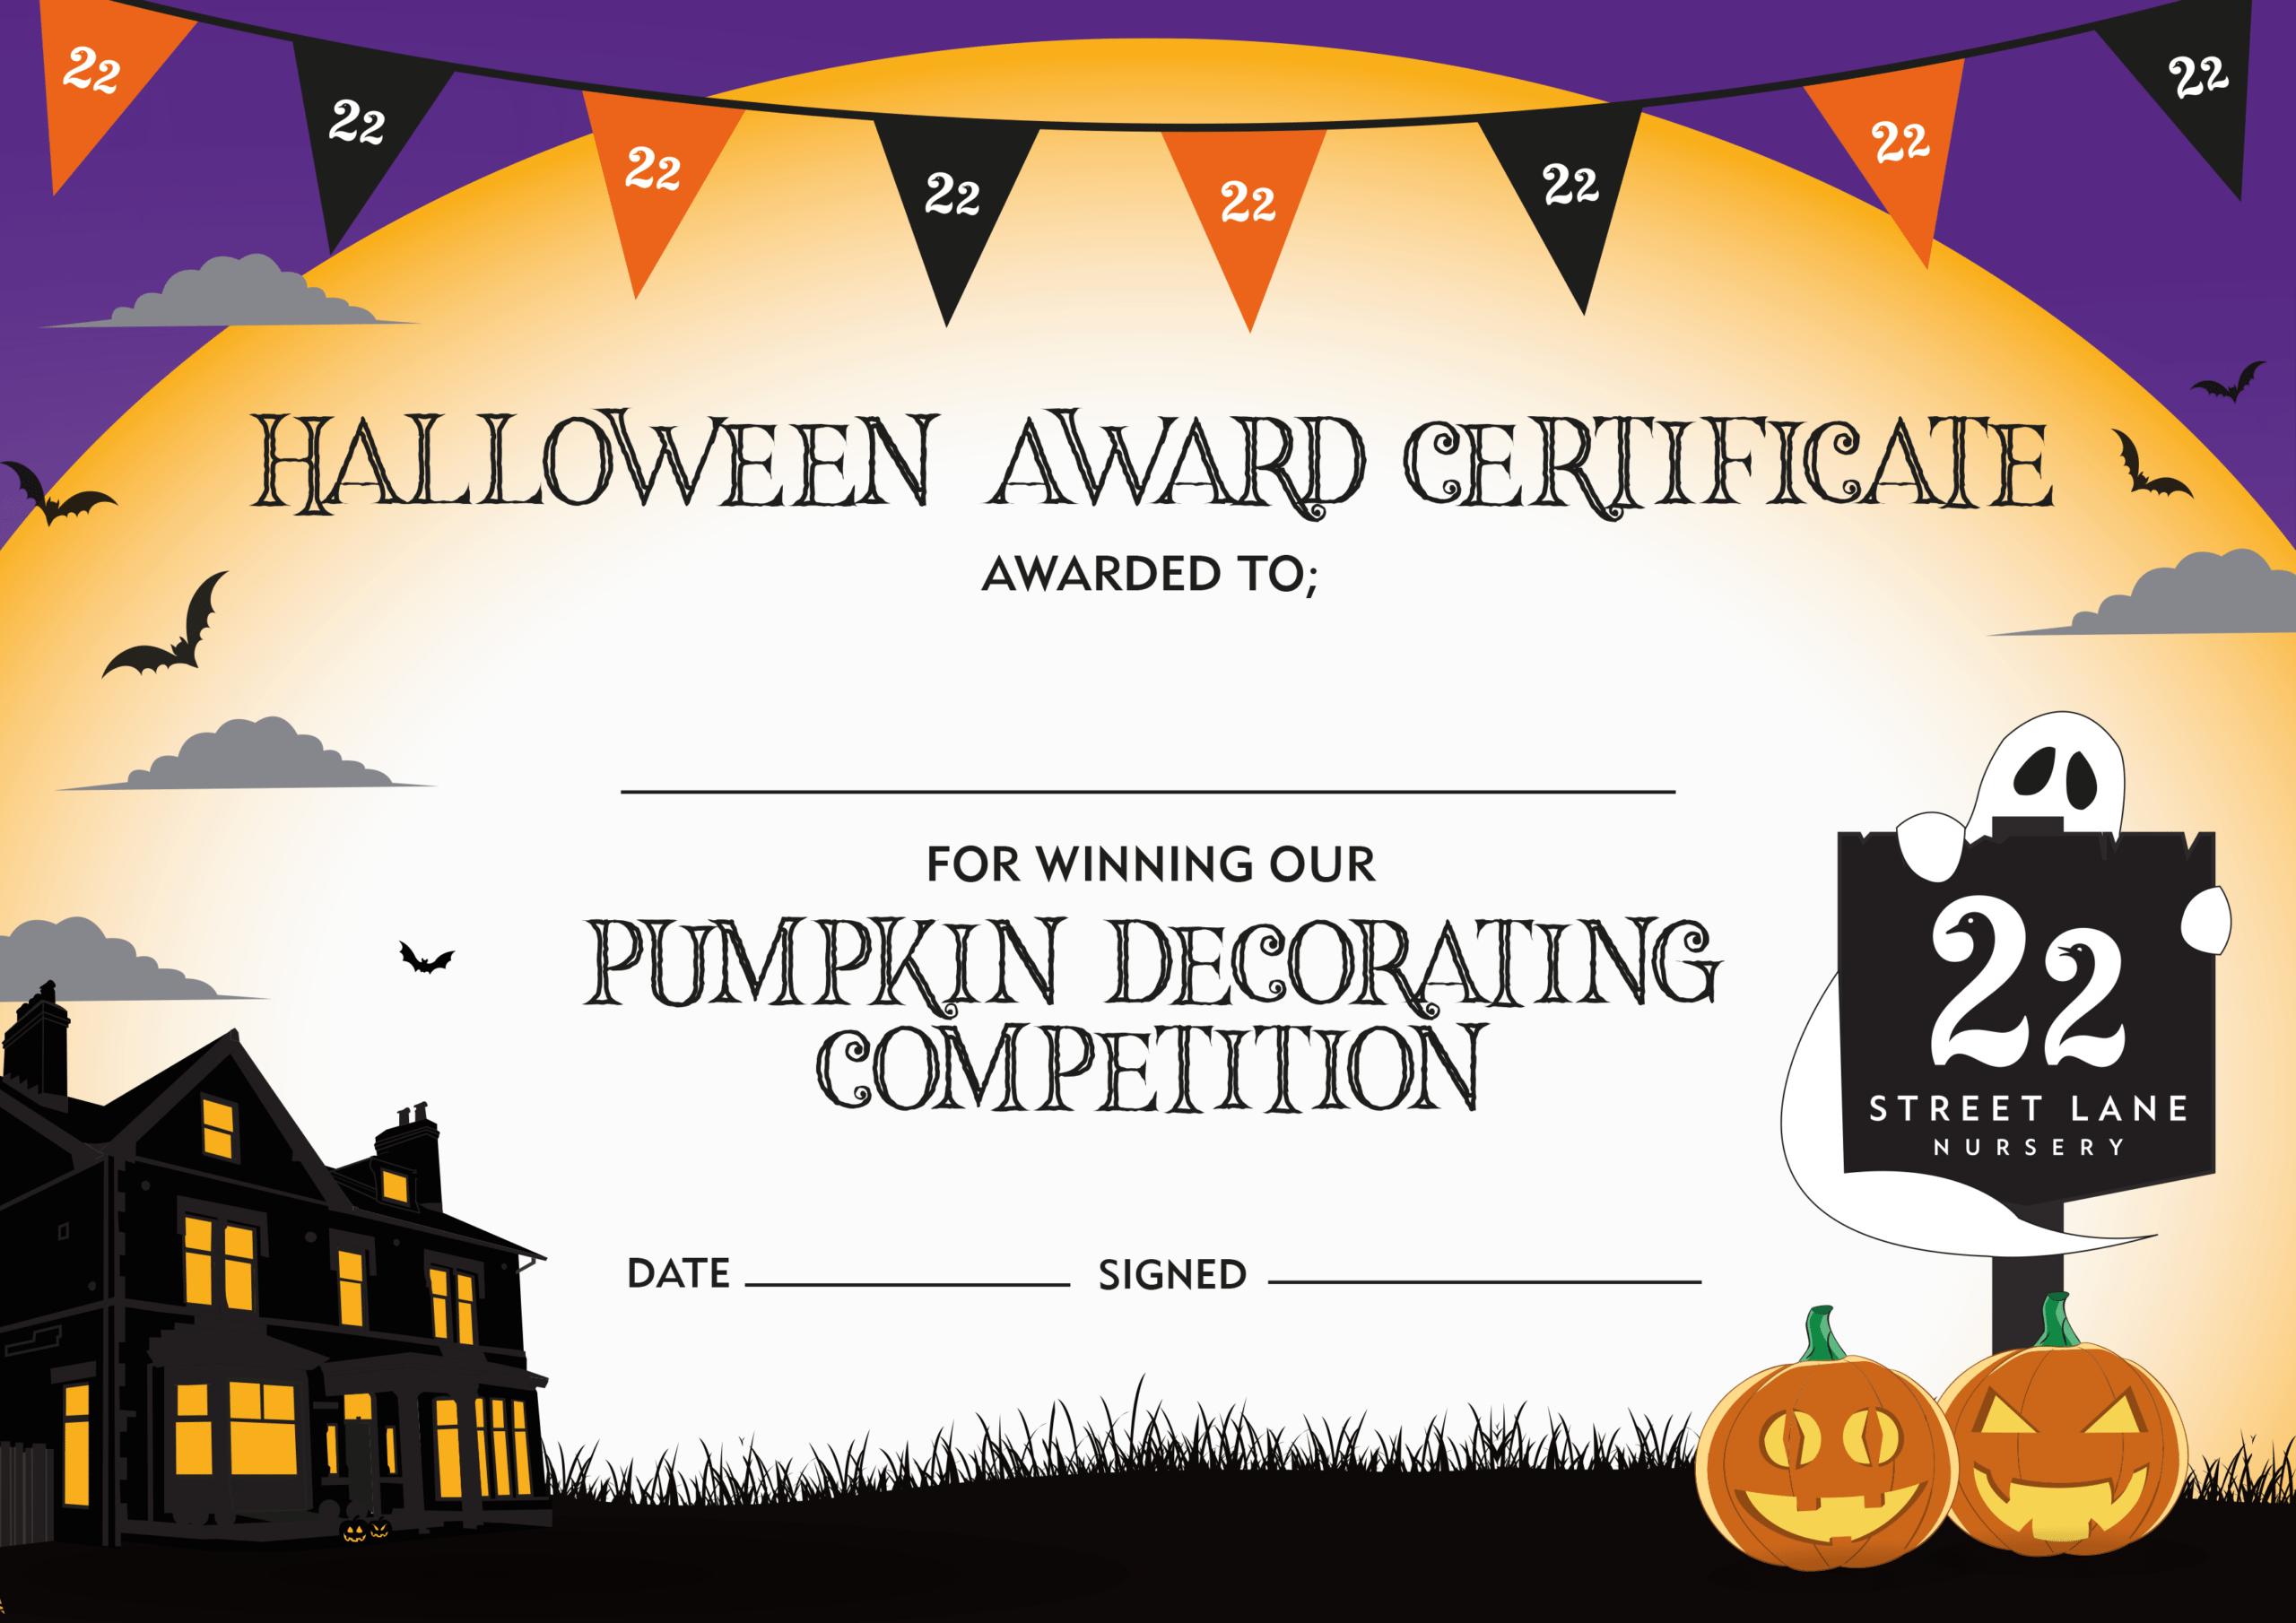 Halloween Pumpkin Decorating Competition Certificate throughout Halloween Certificate Template